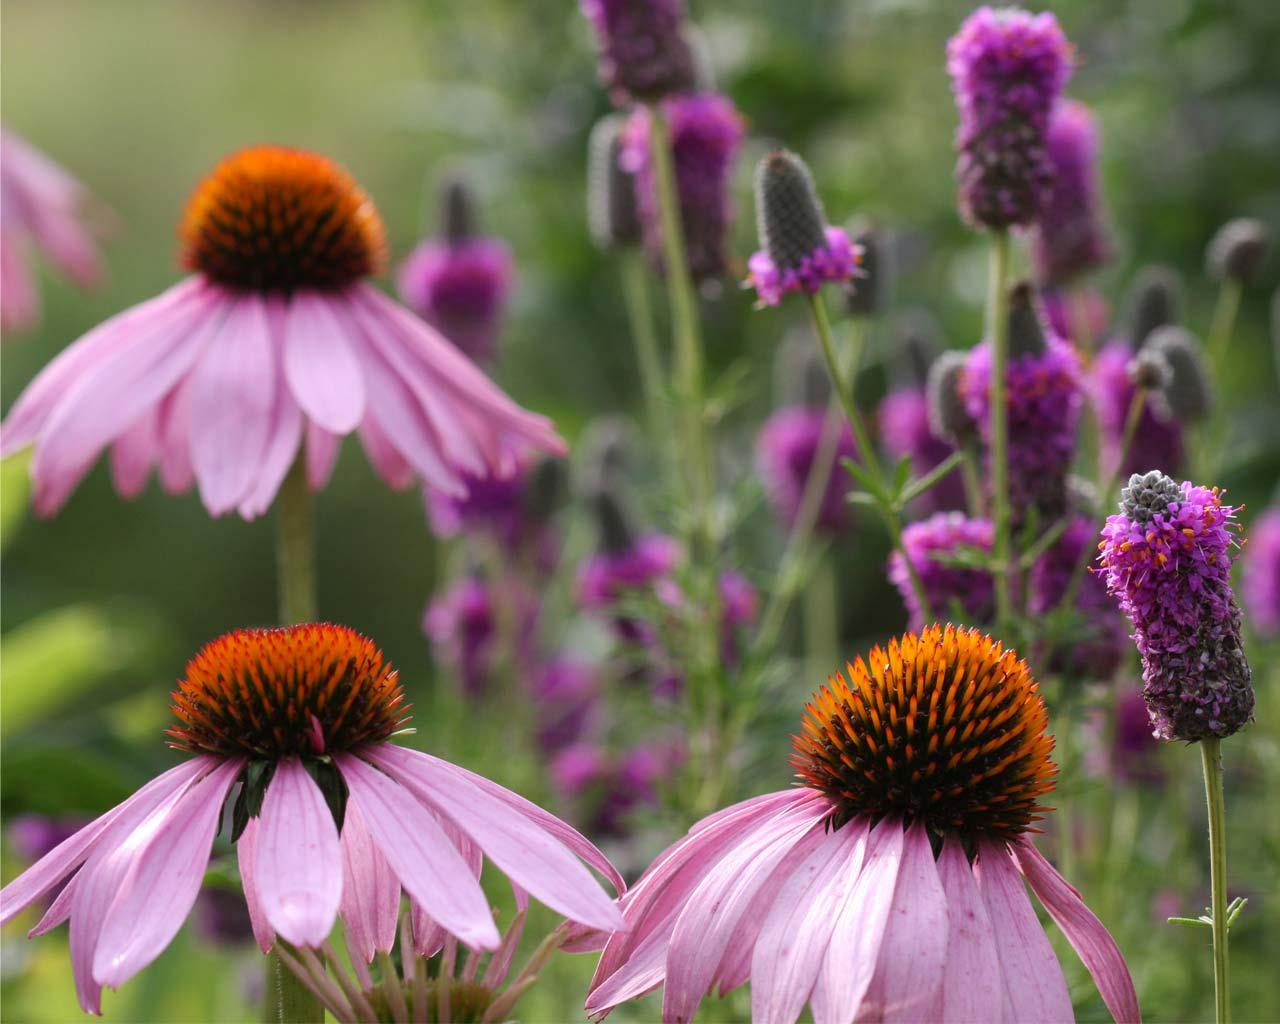 Wildflowers / Fleurs sauvages